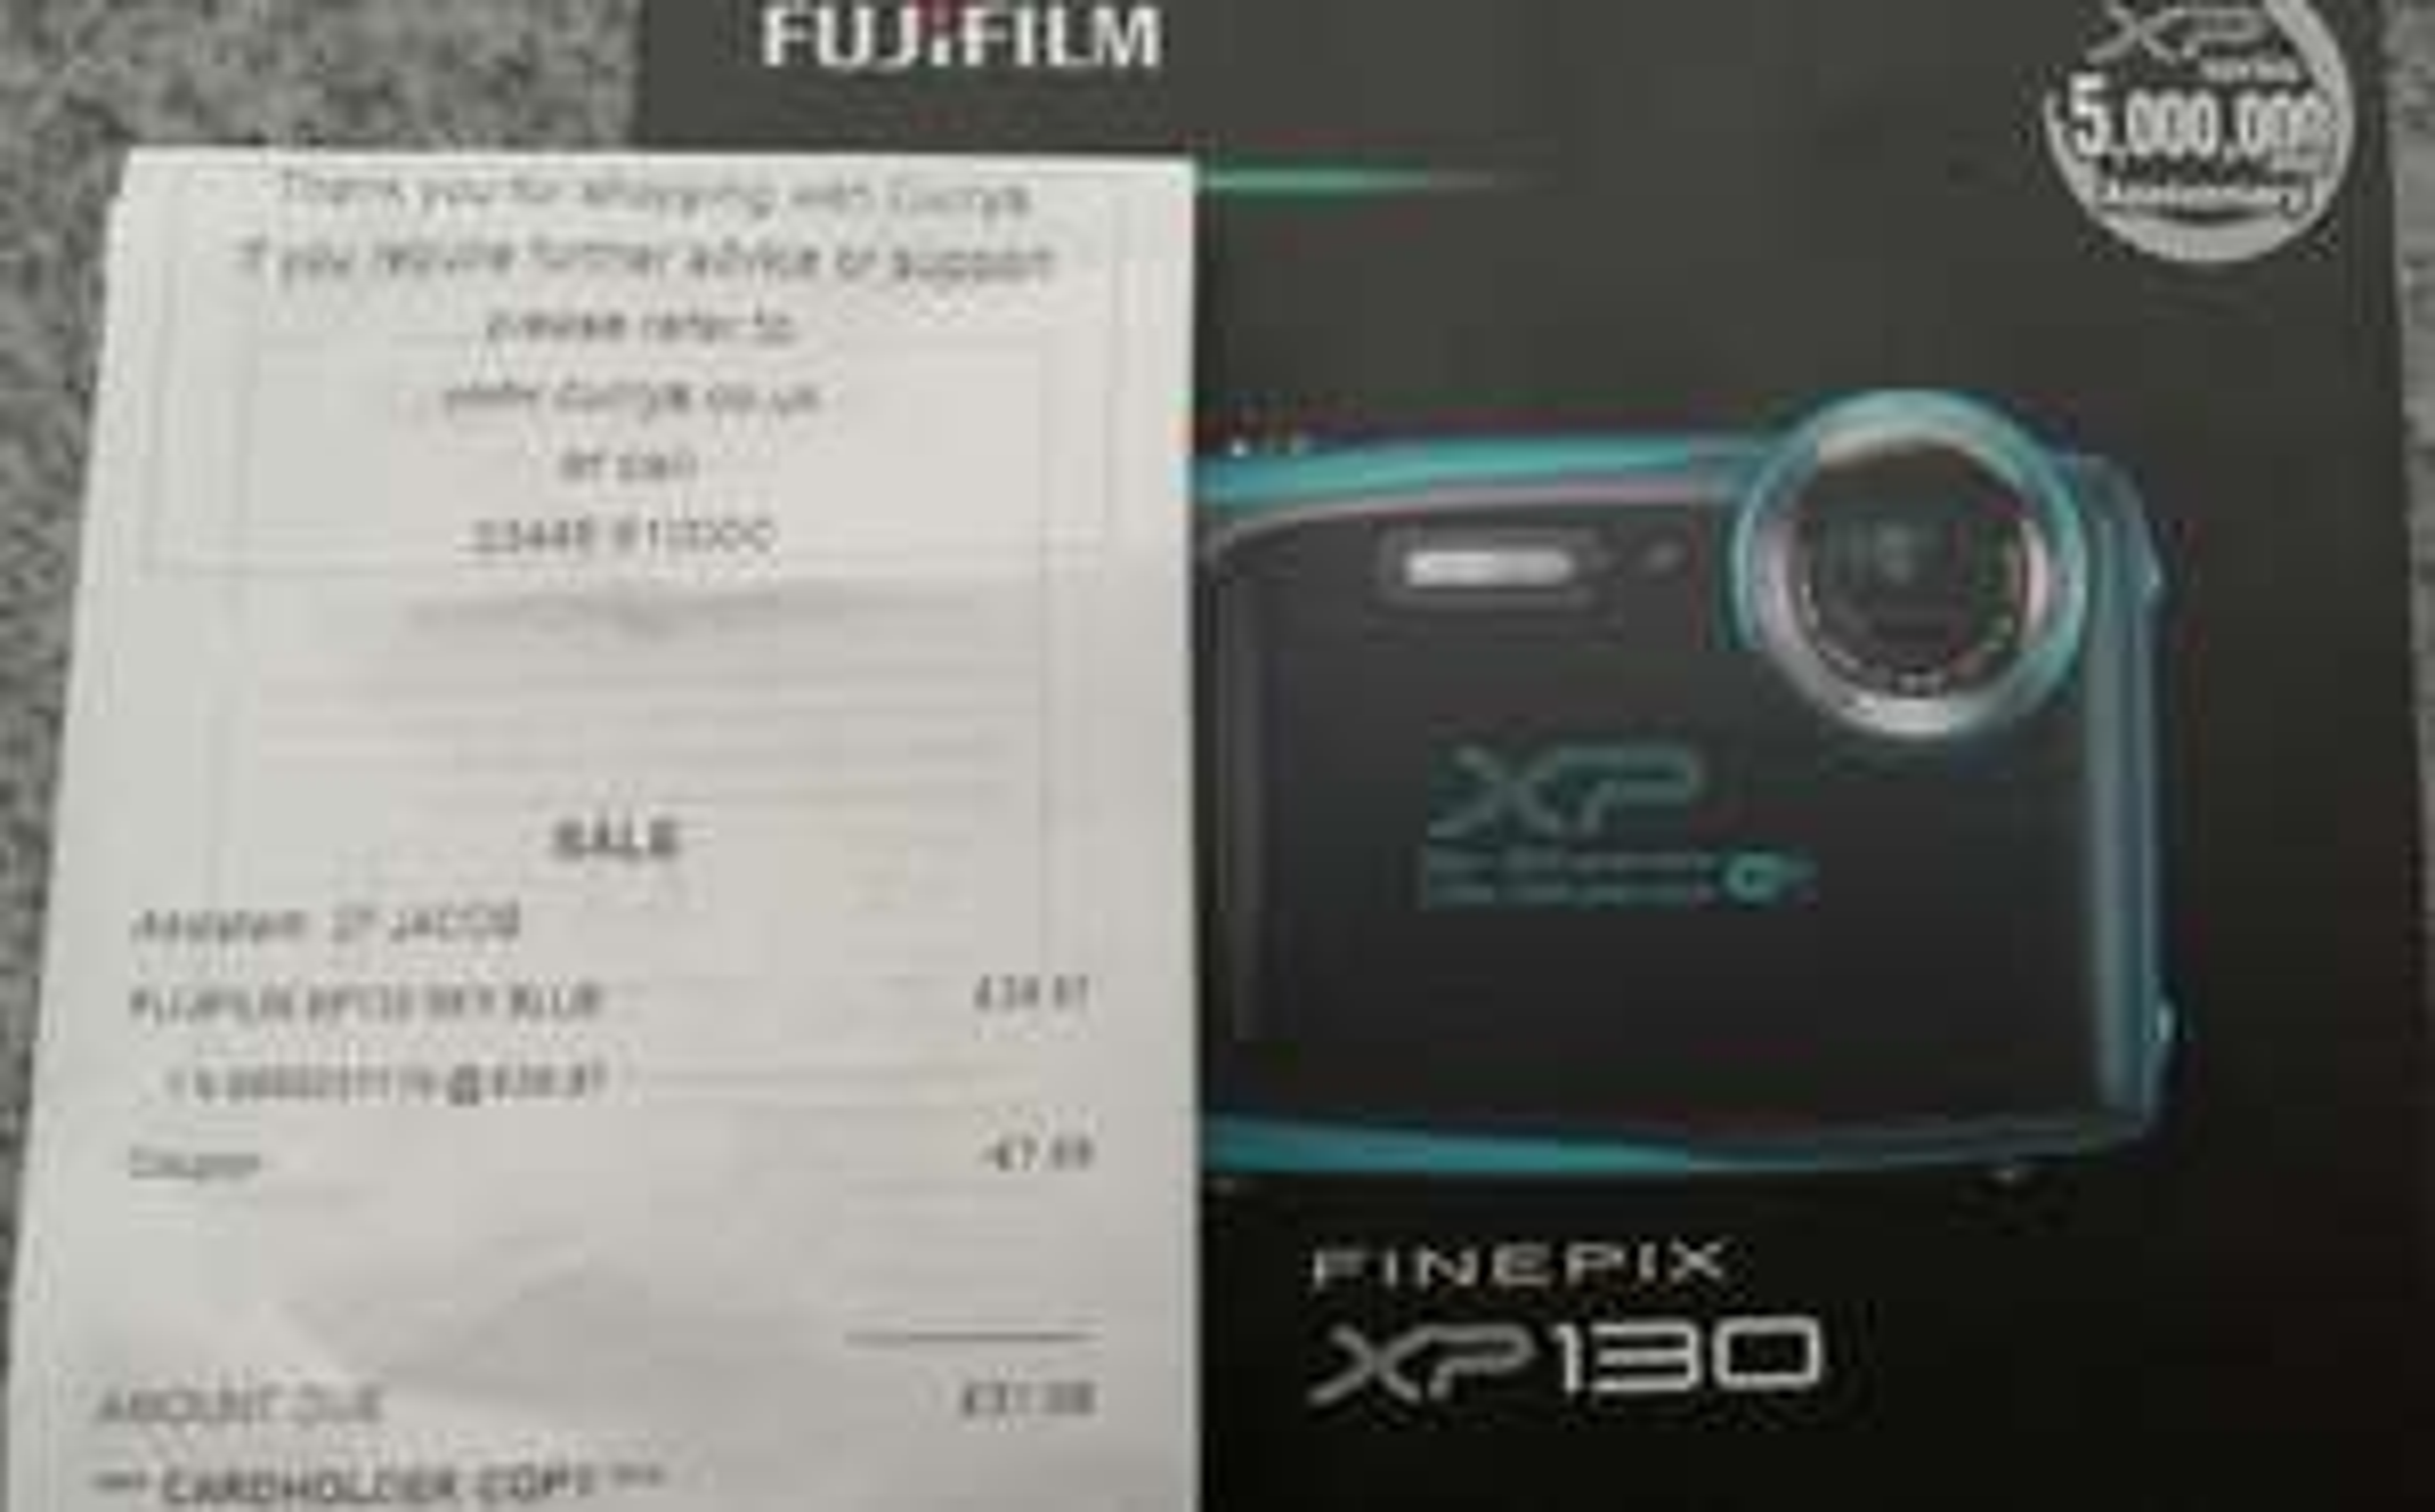 Fuji finepix xp130 £31.98 @ Currys PC World Coventry